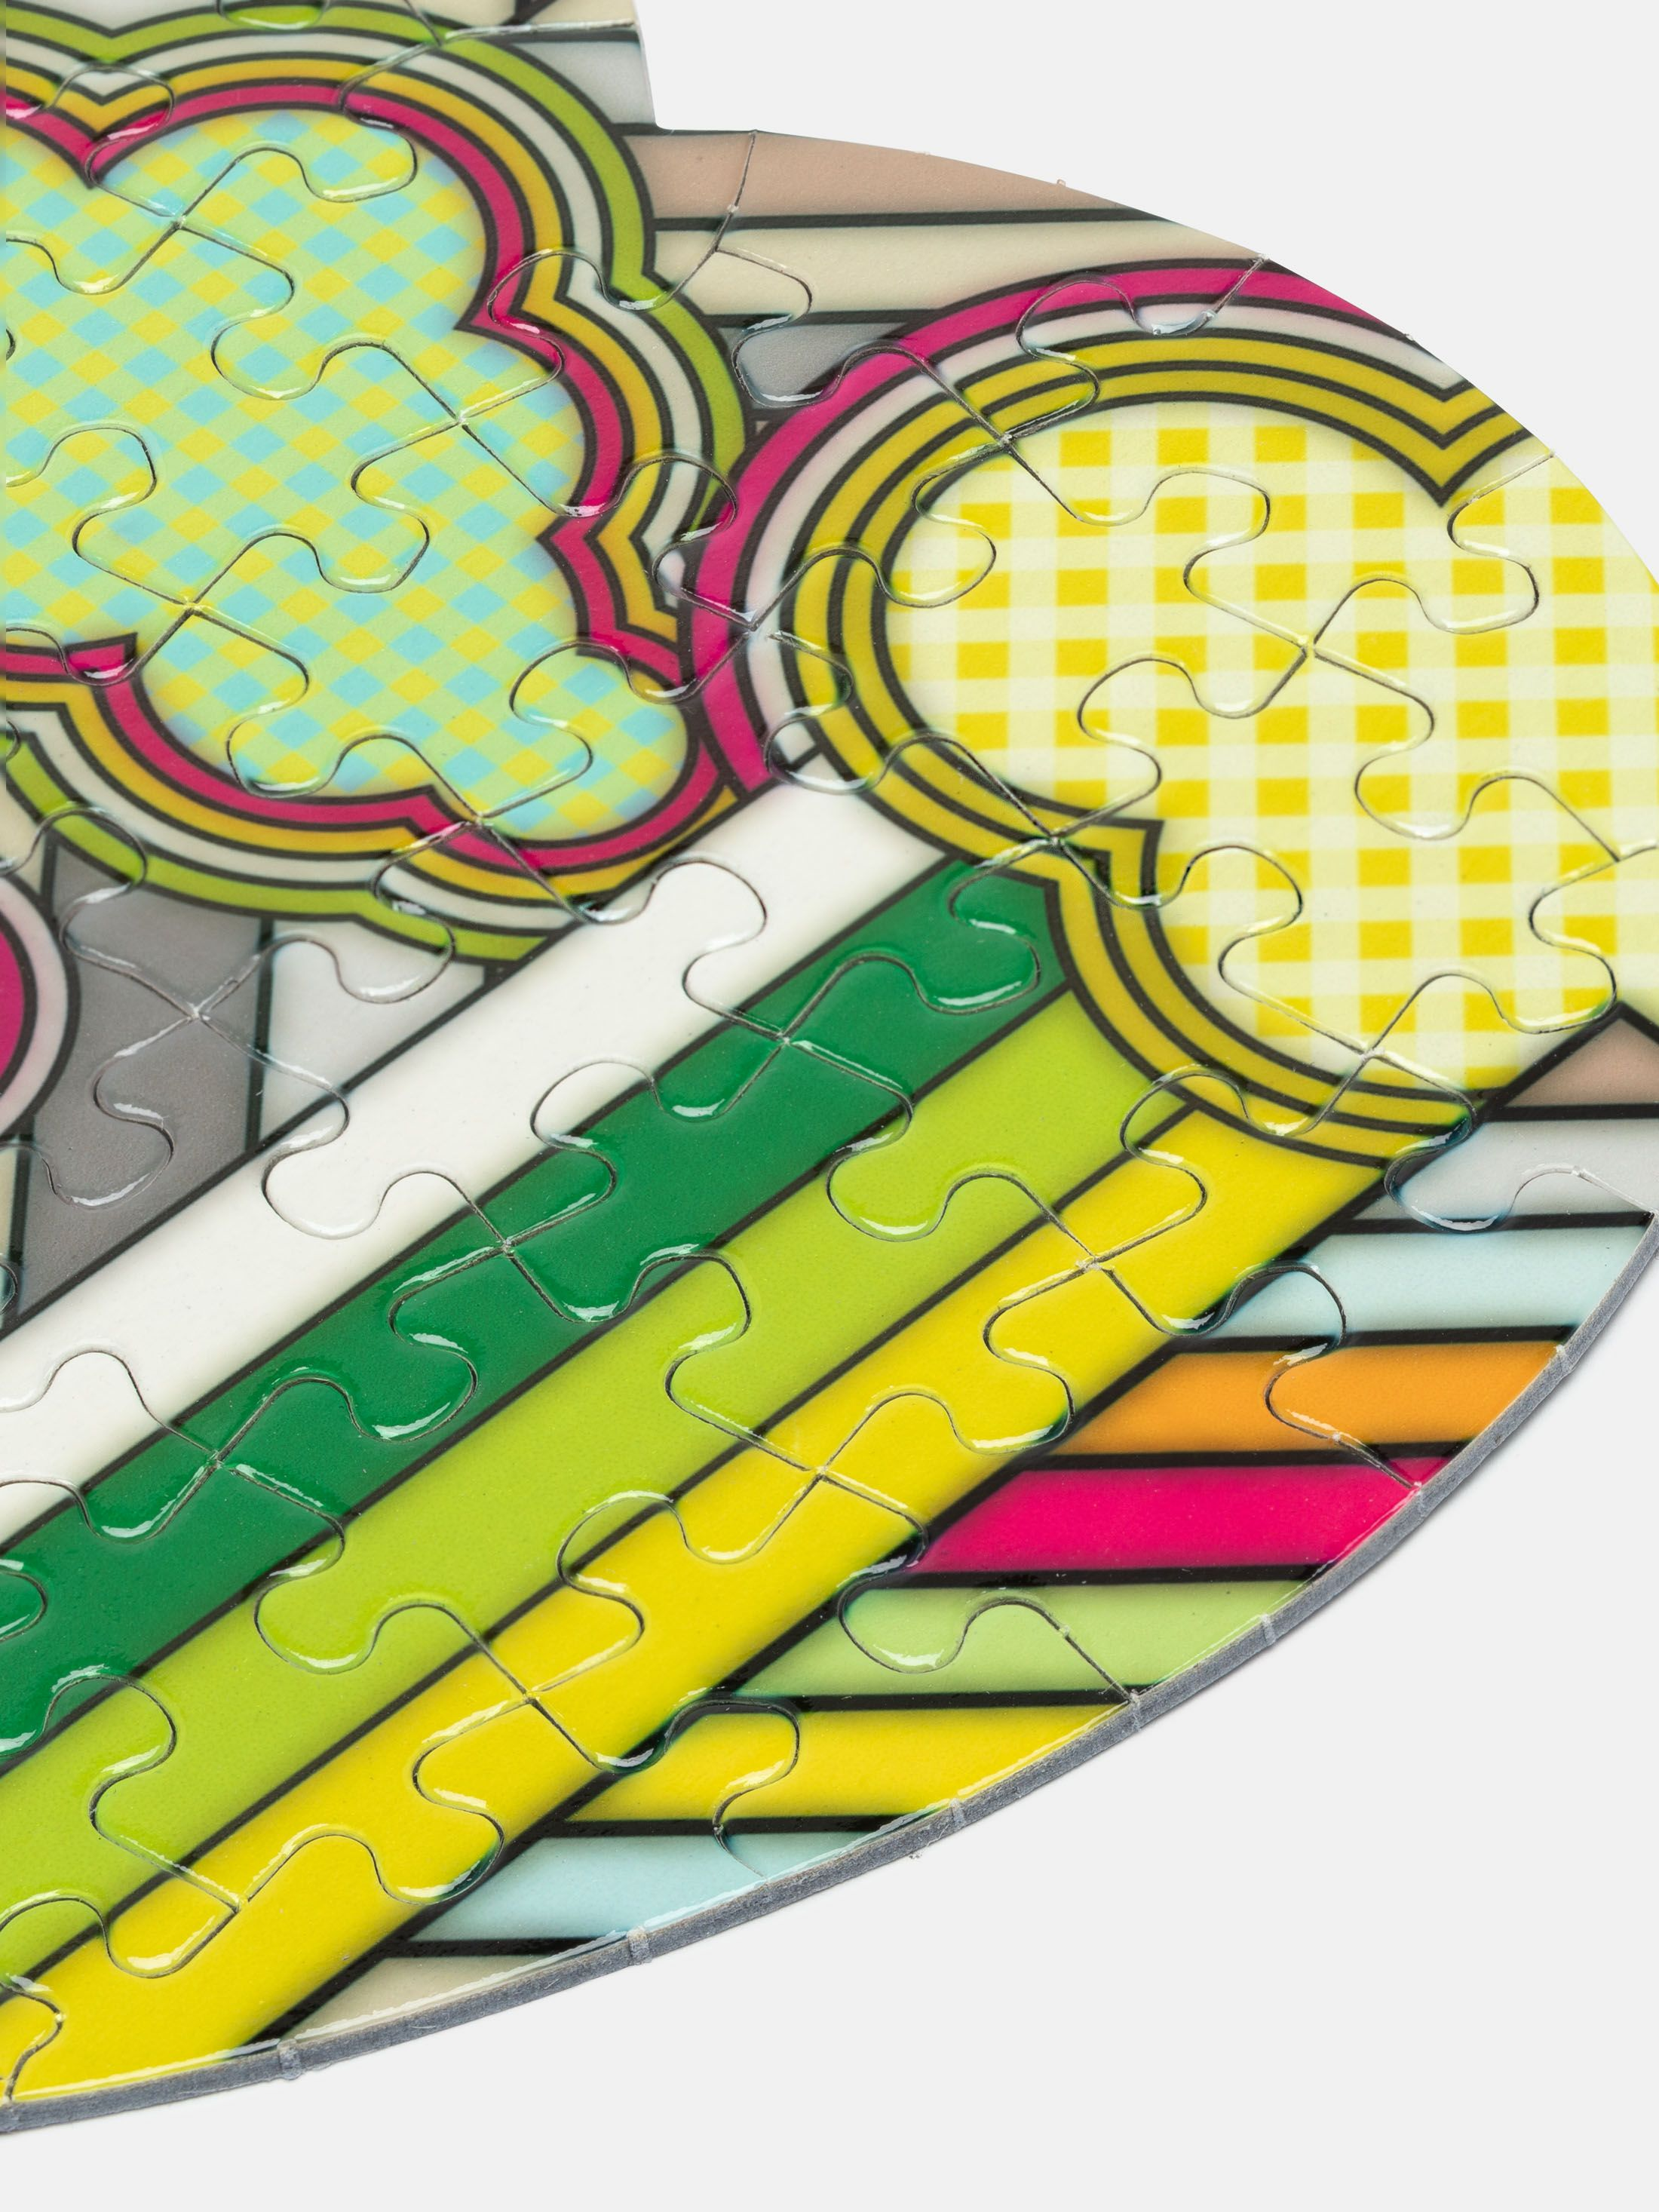 Jigsaw puzzle pieces closeups